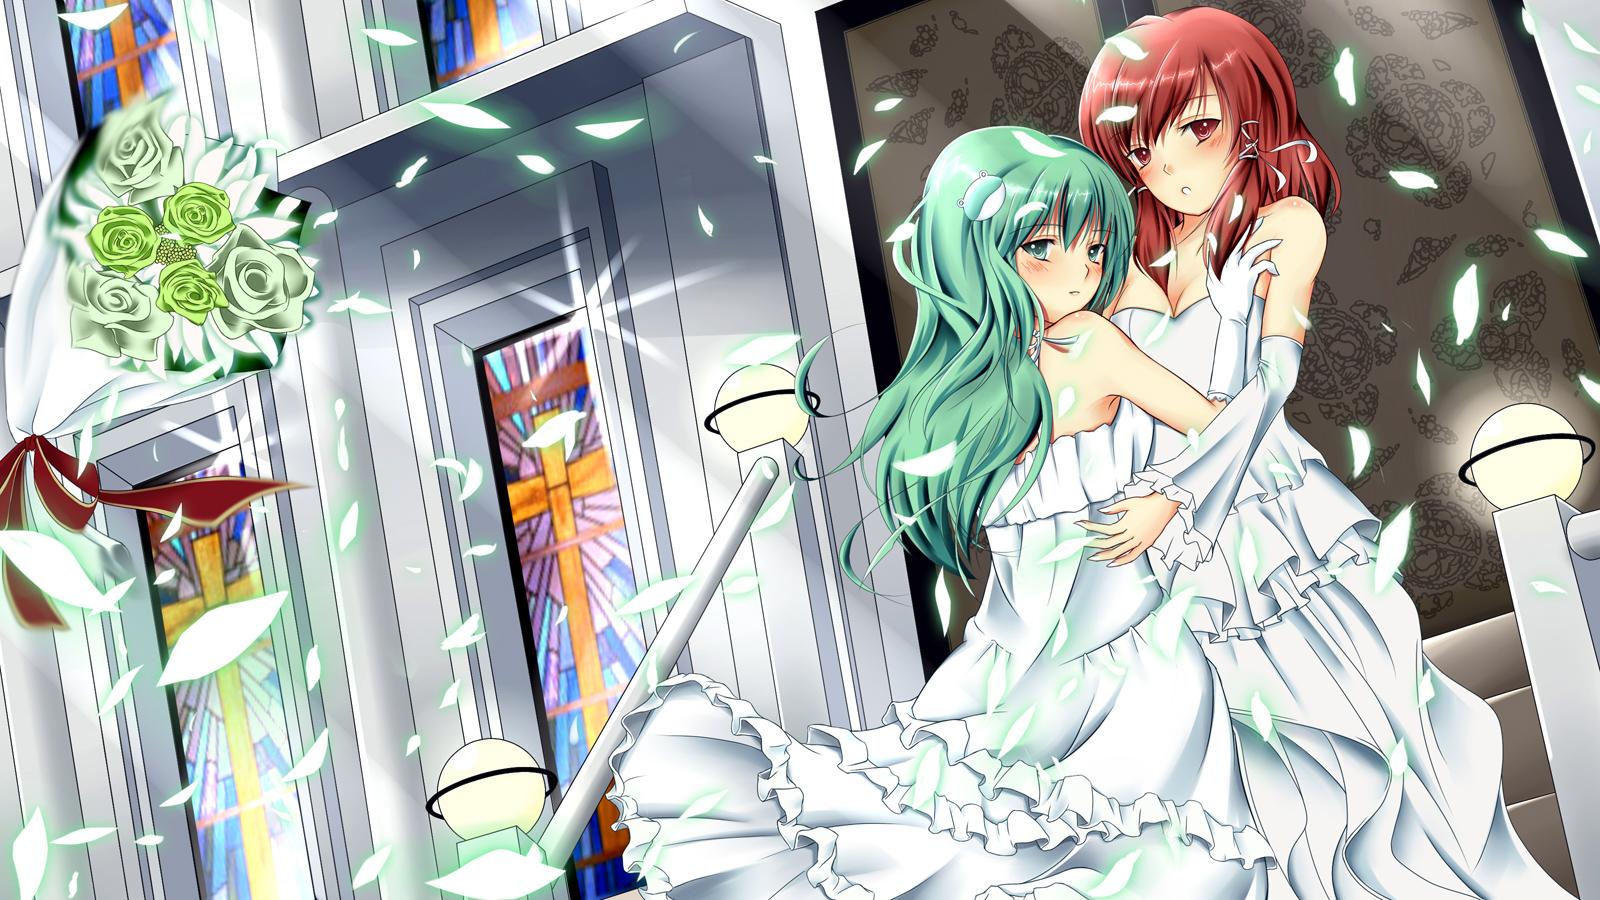 green_eyes green_hair hakurei_reimu kochiya_sanae red_eyes red_hair shoujo_ai touhou wedding wedding_attire